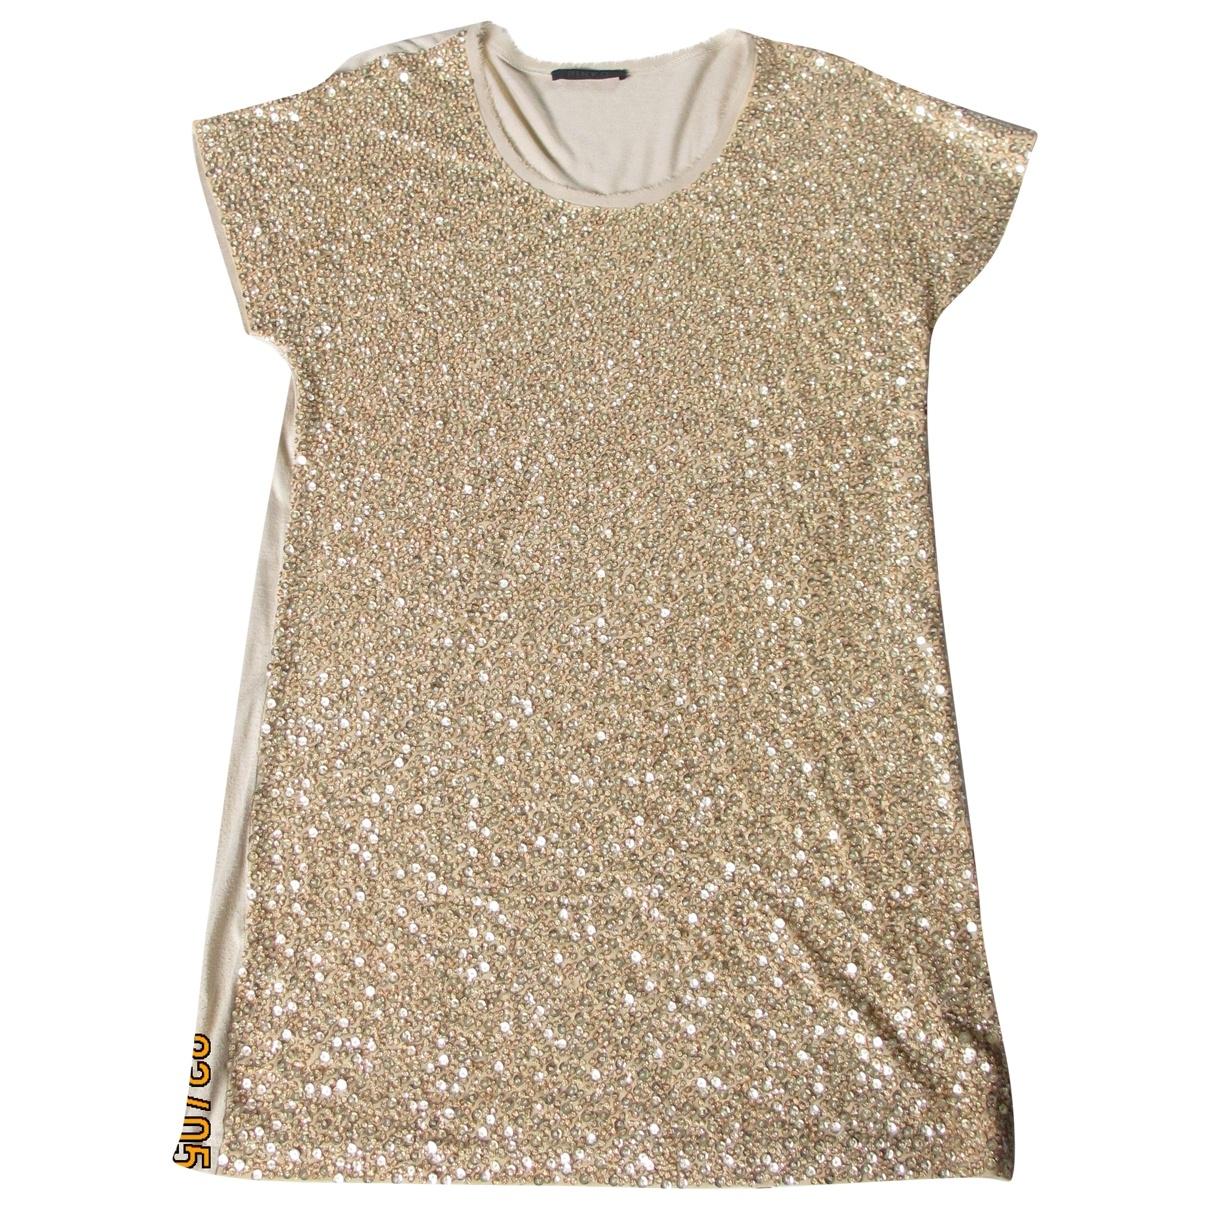 Pinko \N Beige Glitter dress for Women M International